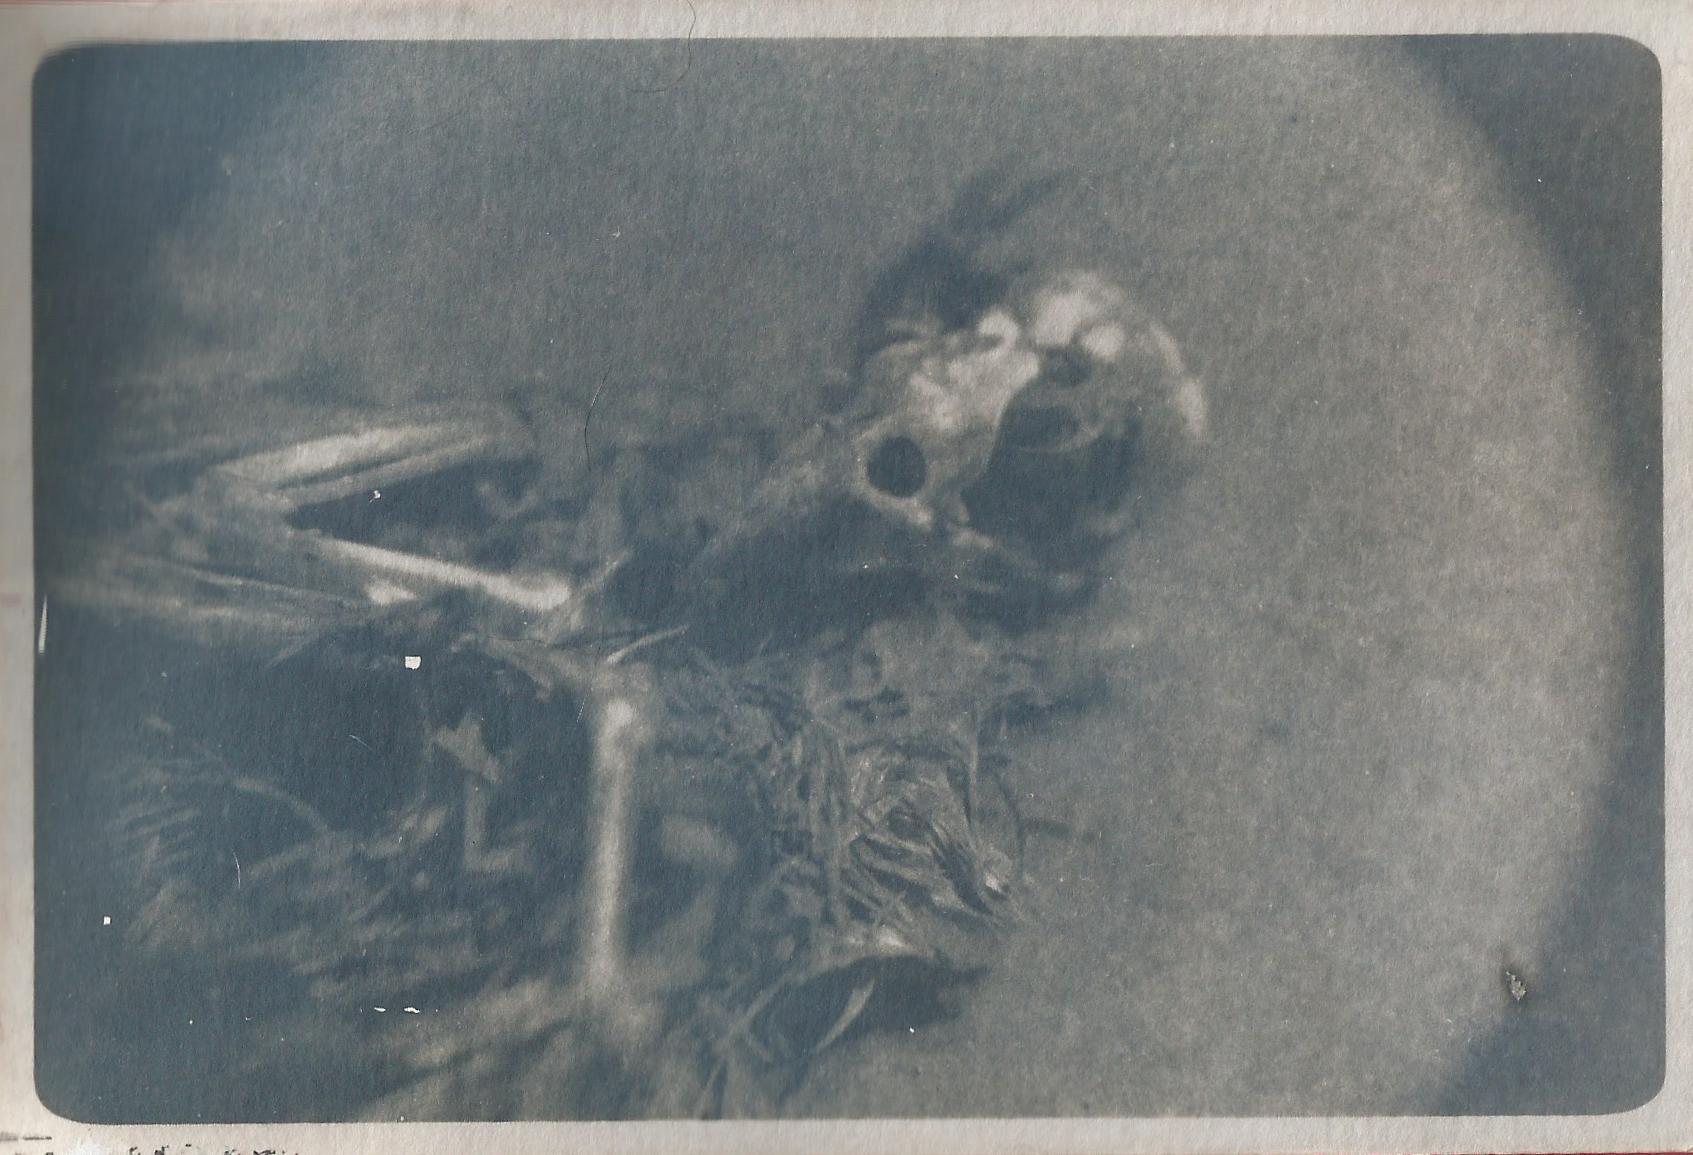 a cyanotype of a decaying bird carcass